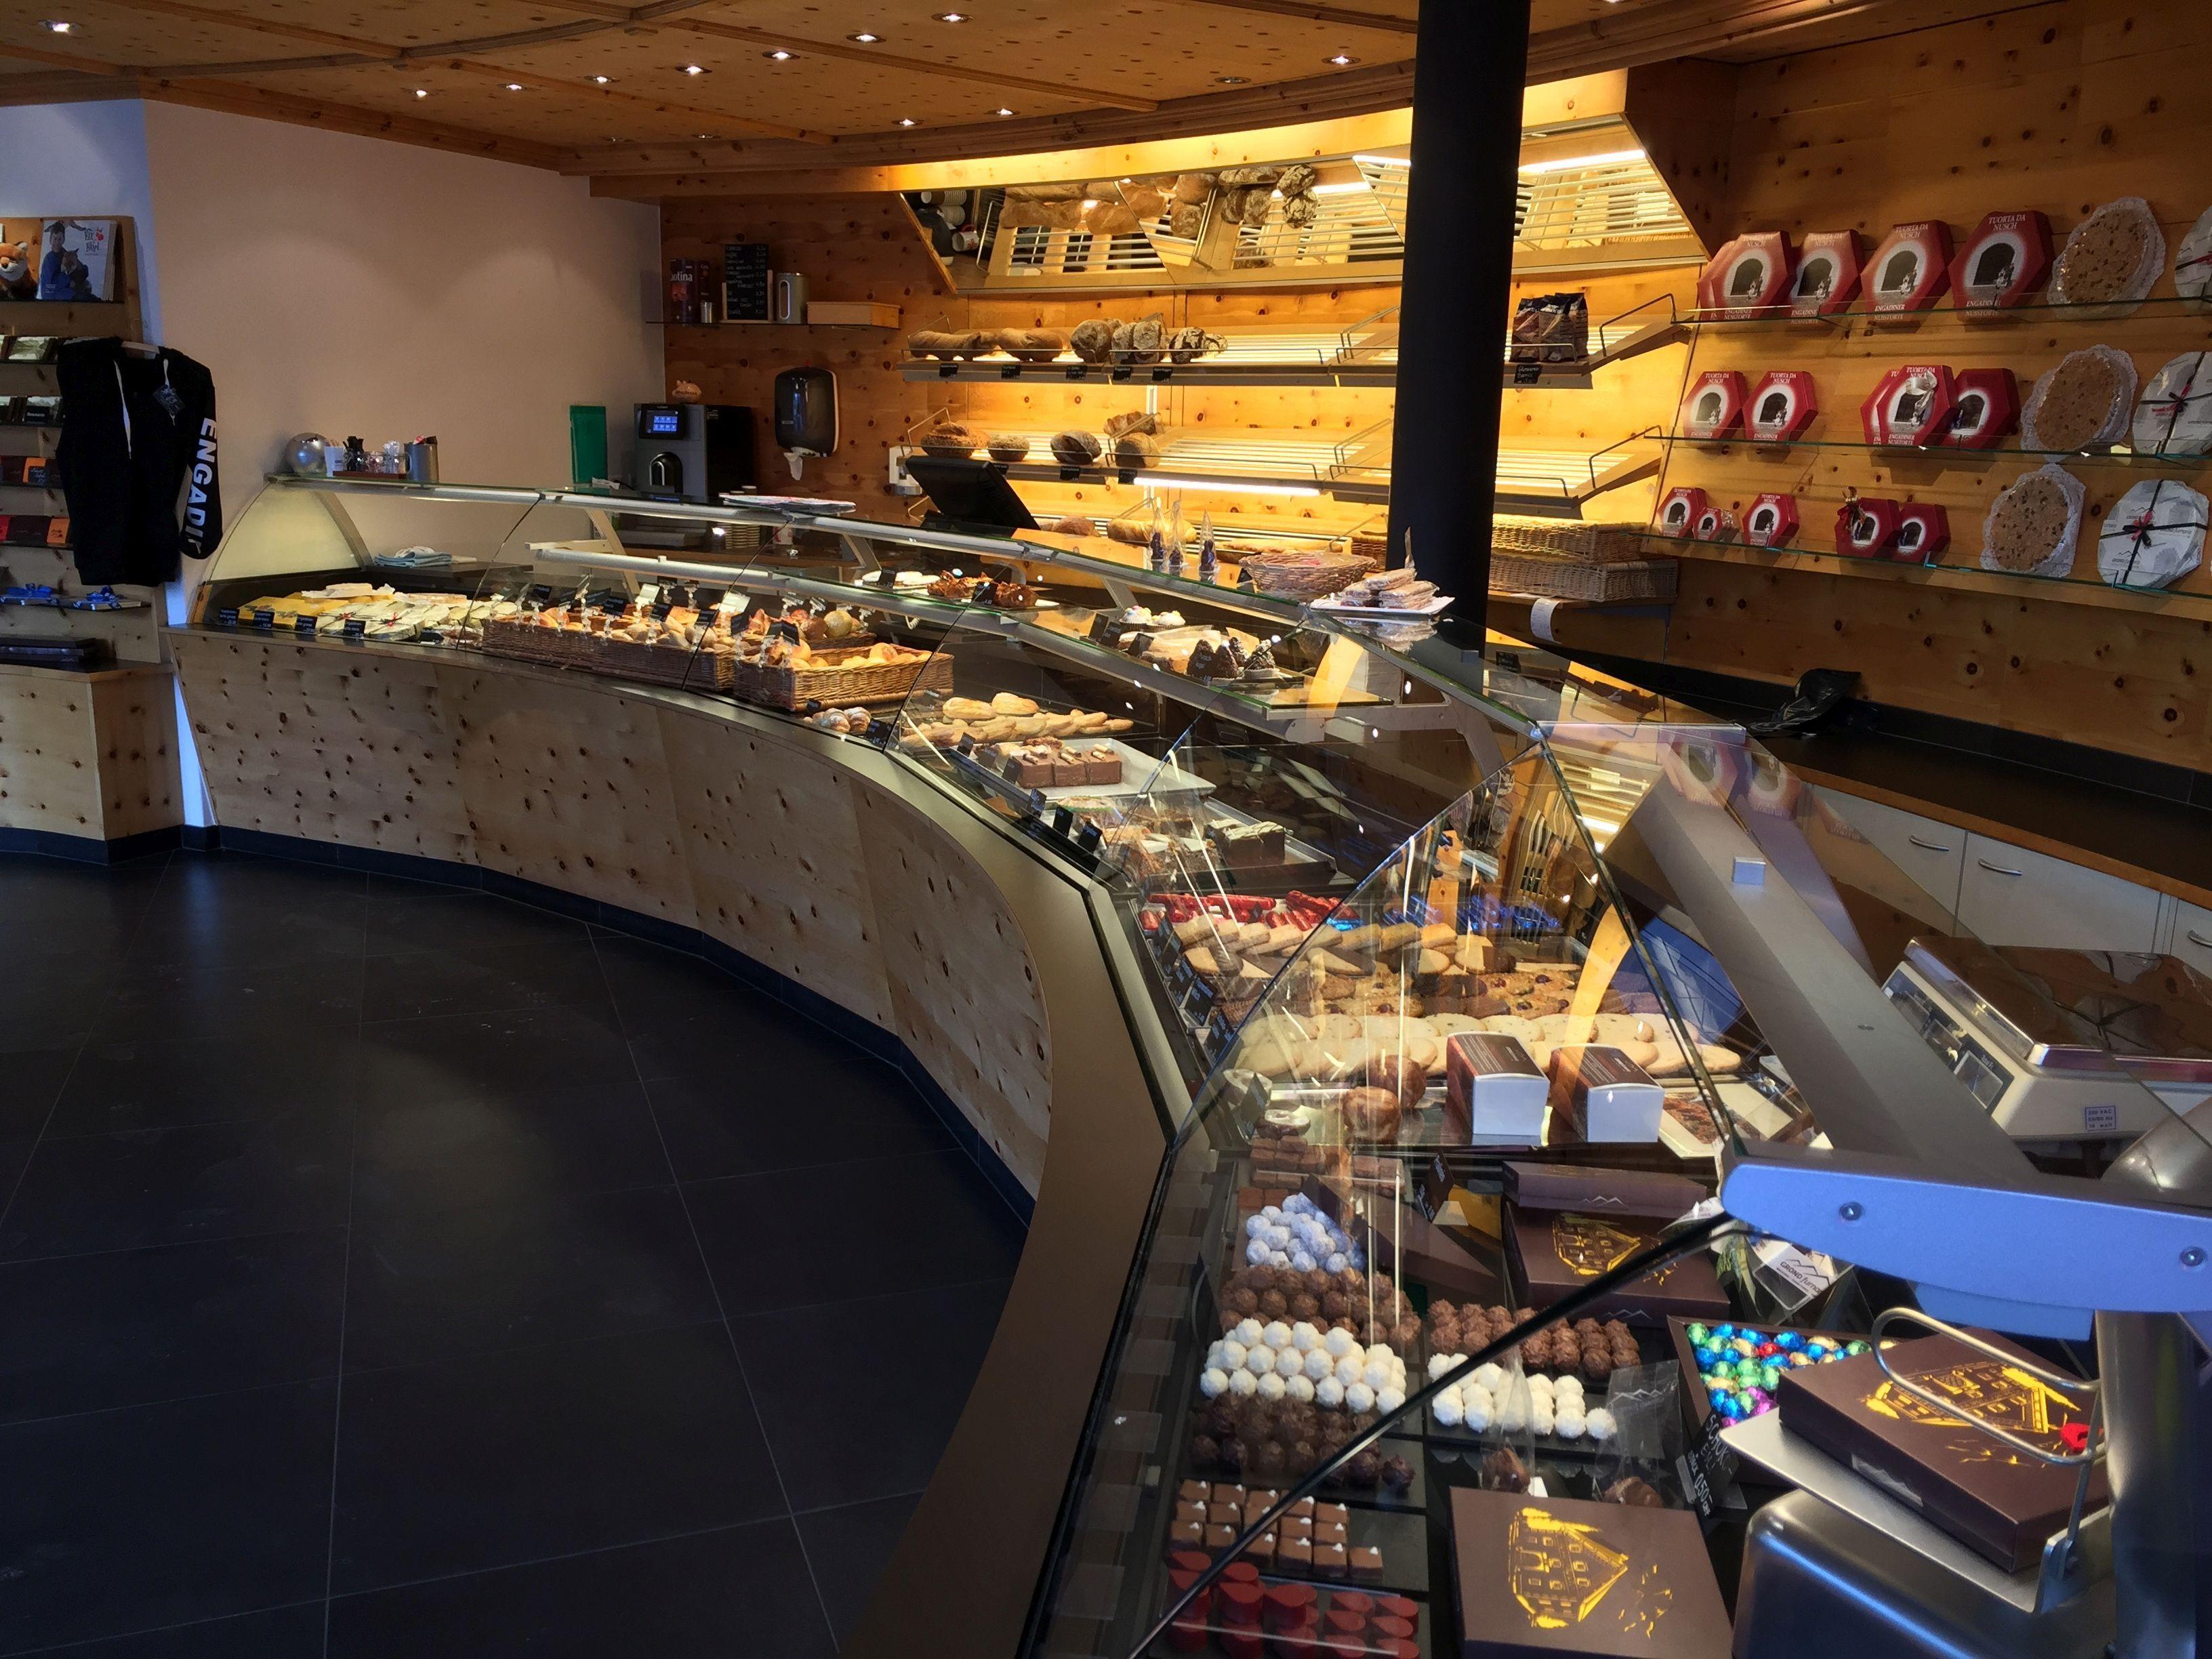 Furnaria Grond Café (Bäckerei / Konditorei) Slide 4